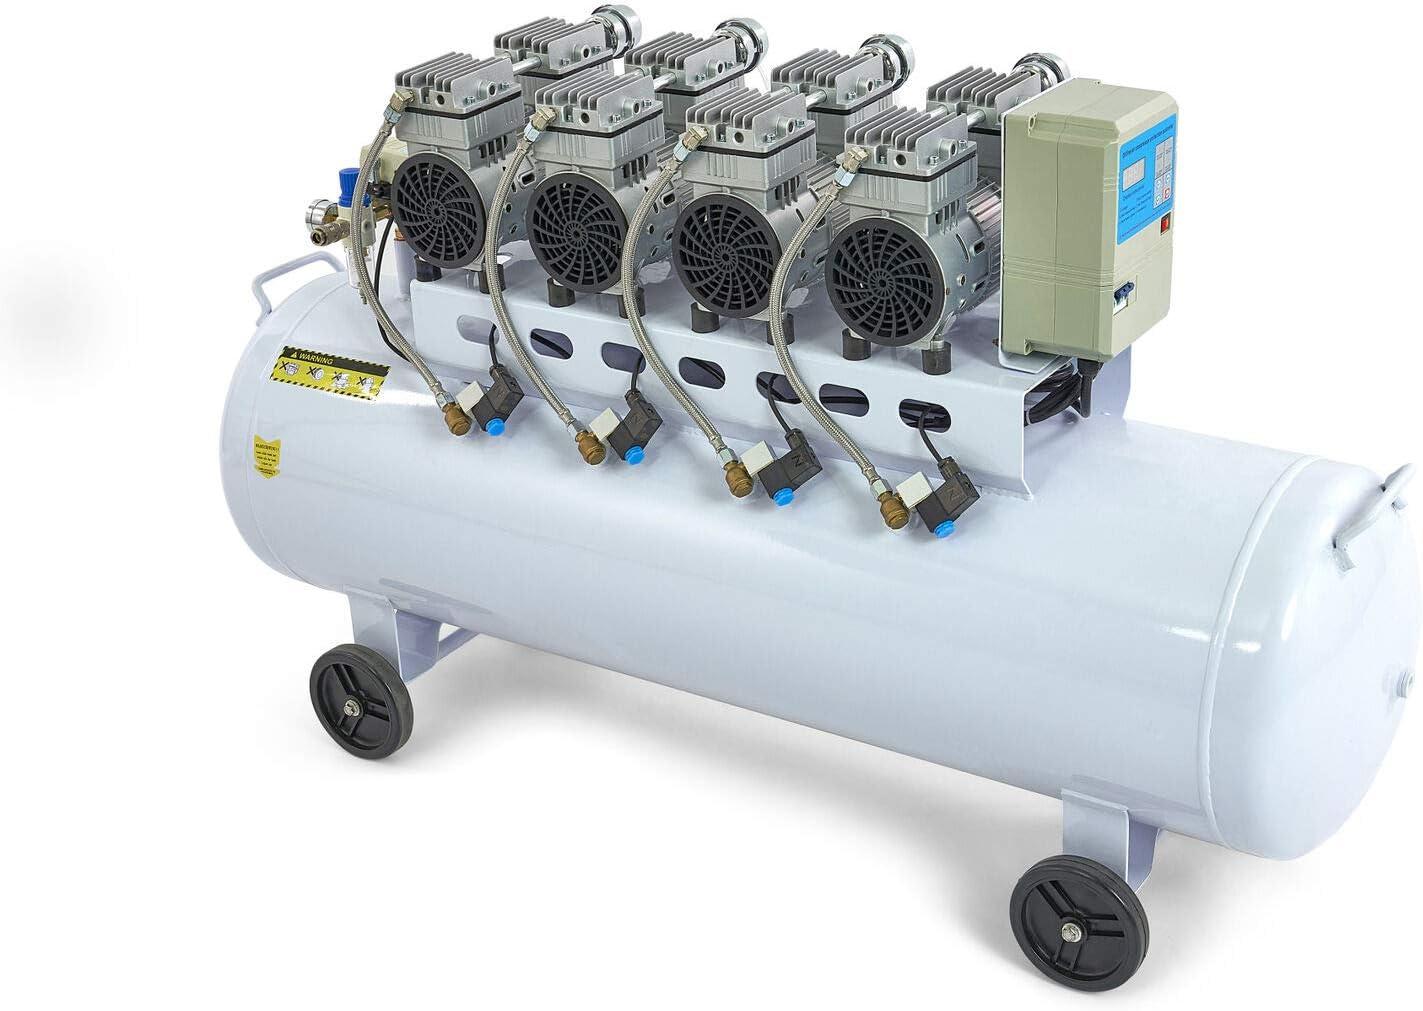 9267 Super Leiser Kompressor Leiseläufer 53 64 Db 200 Liter Kessel Sehr Leise 64 Db 10 Bar Baumarkt